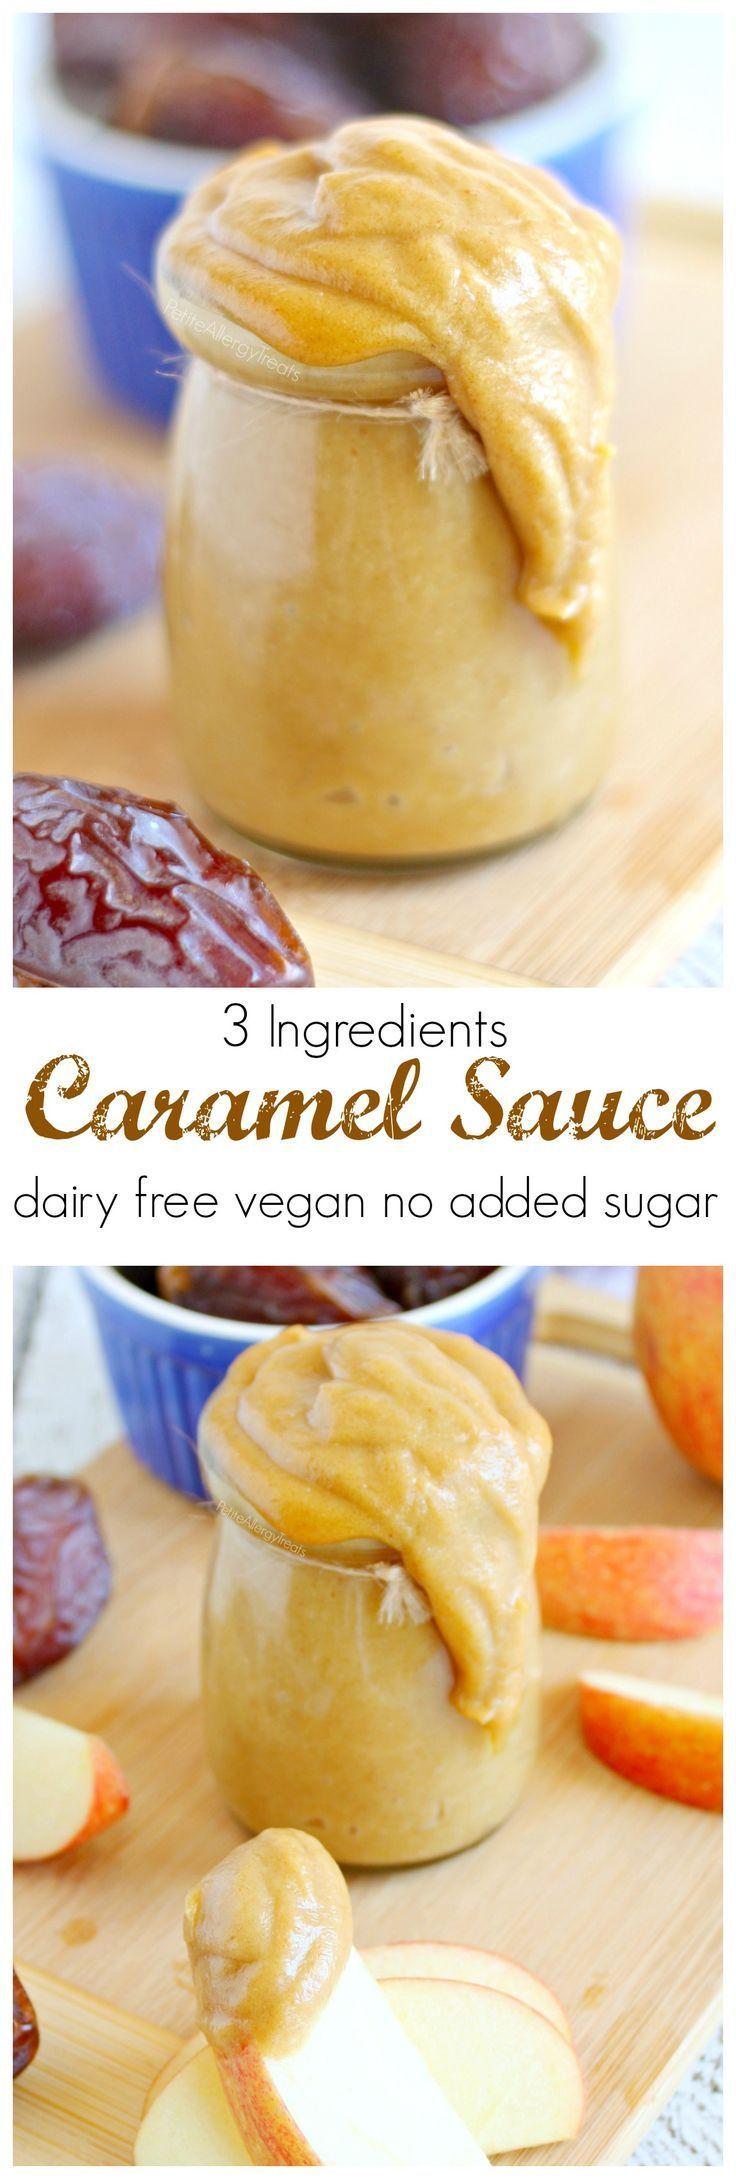 Caramel sauce dairy free vegan petite allergy treats